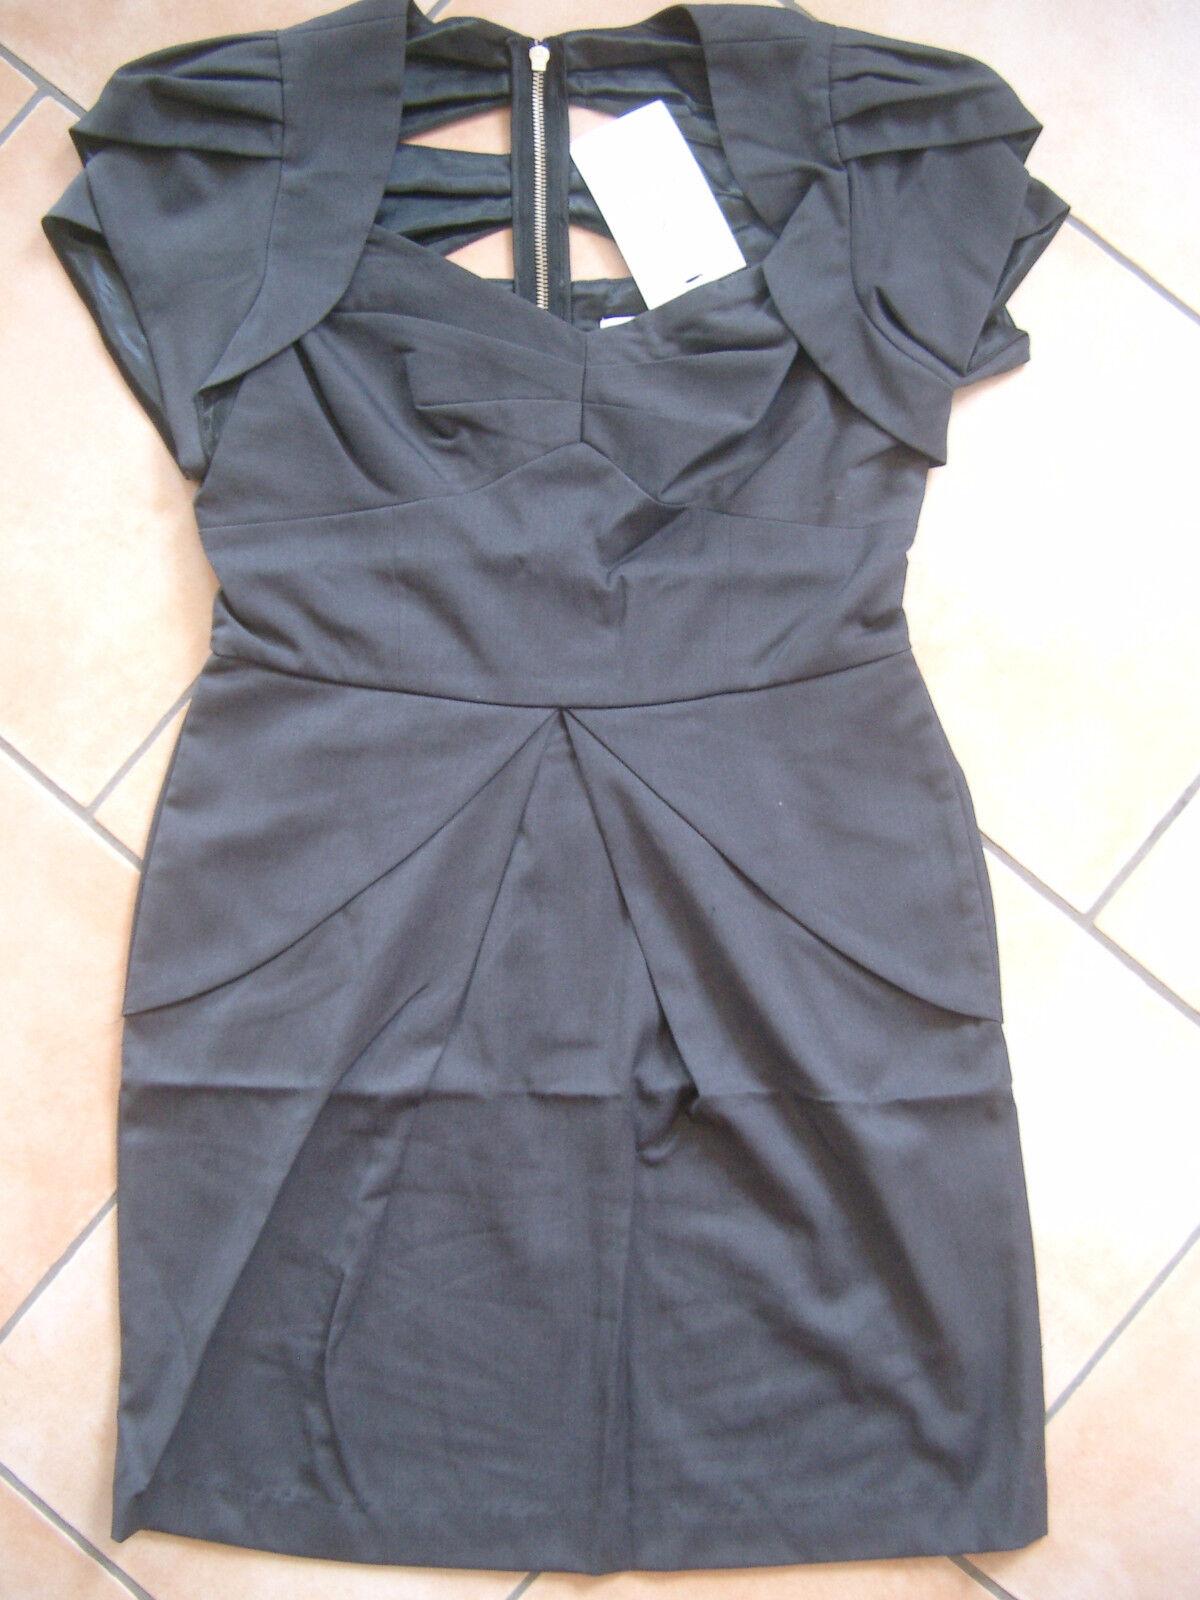 (C652) Neues ausgefallenes Lipsy London Damen Damen Damen Kleid gr. 36-38   Lipsy 10 DR04271   Elegantes und robustes Menü  b61df7